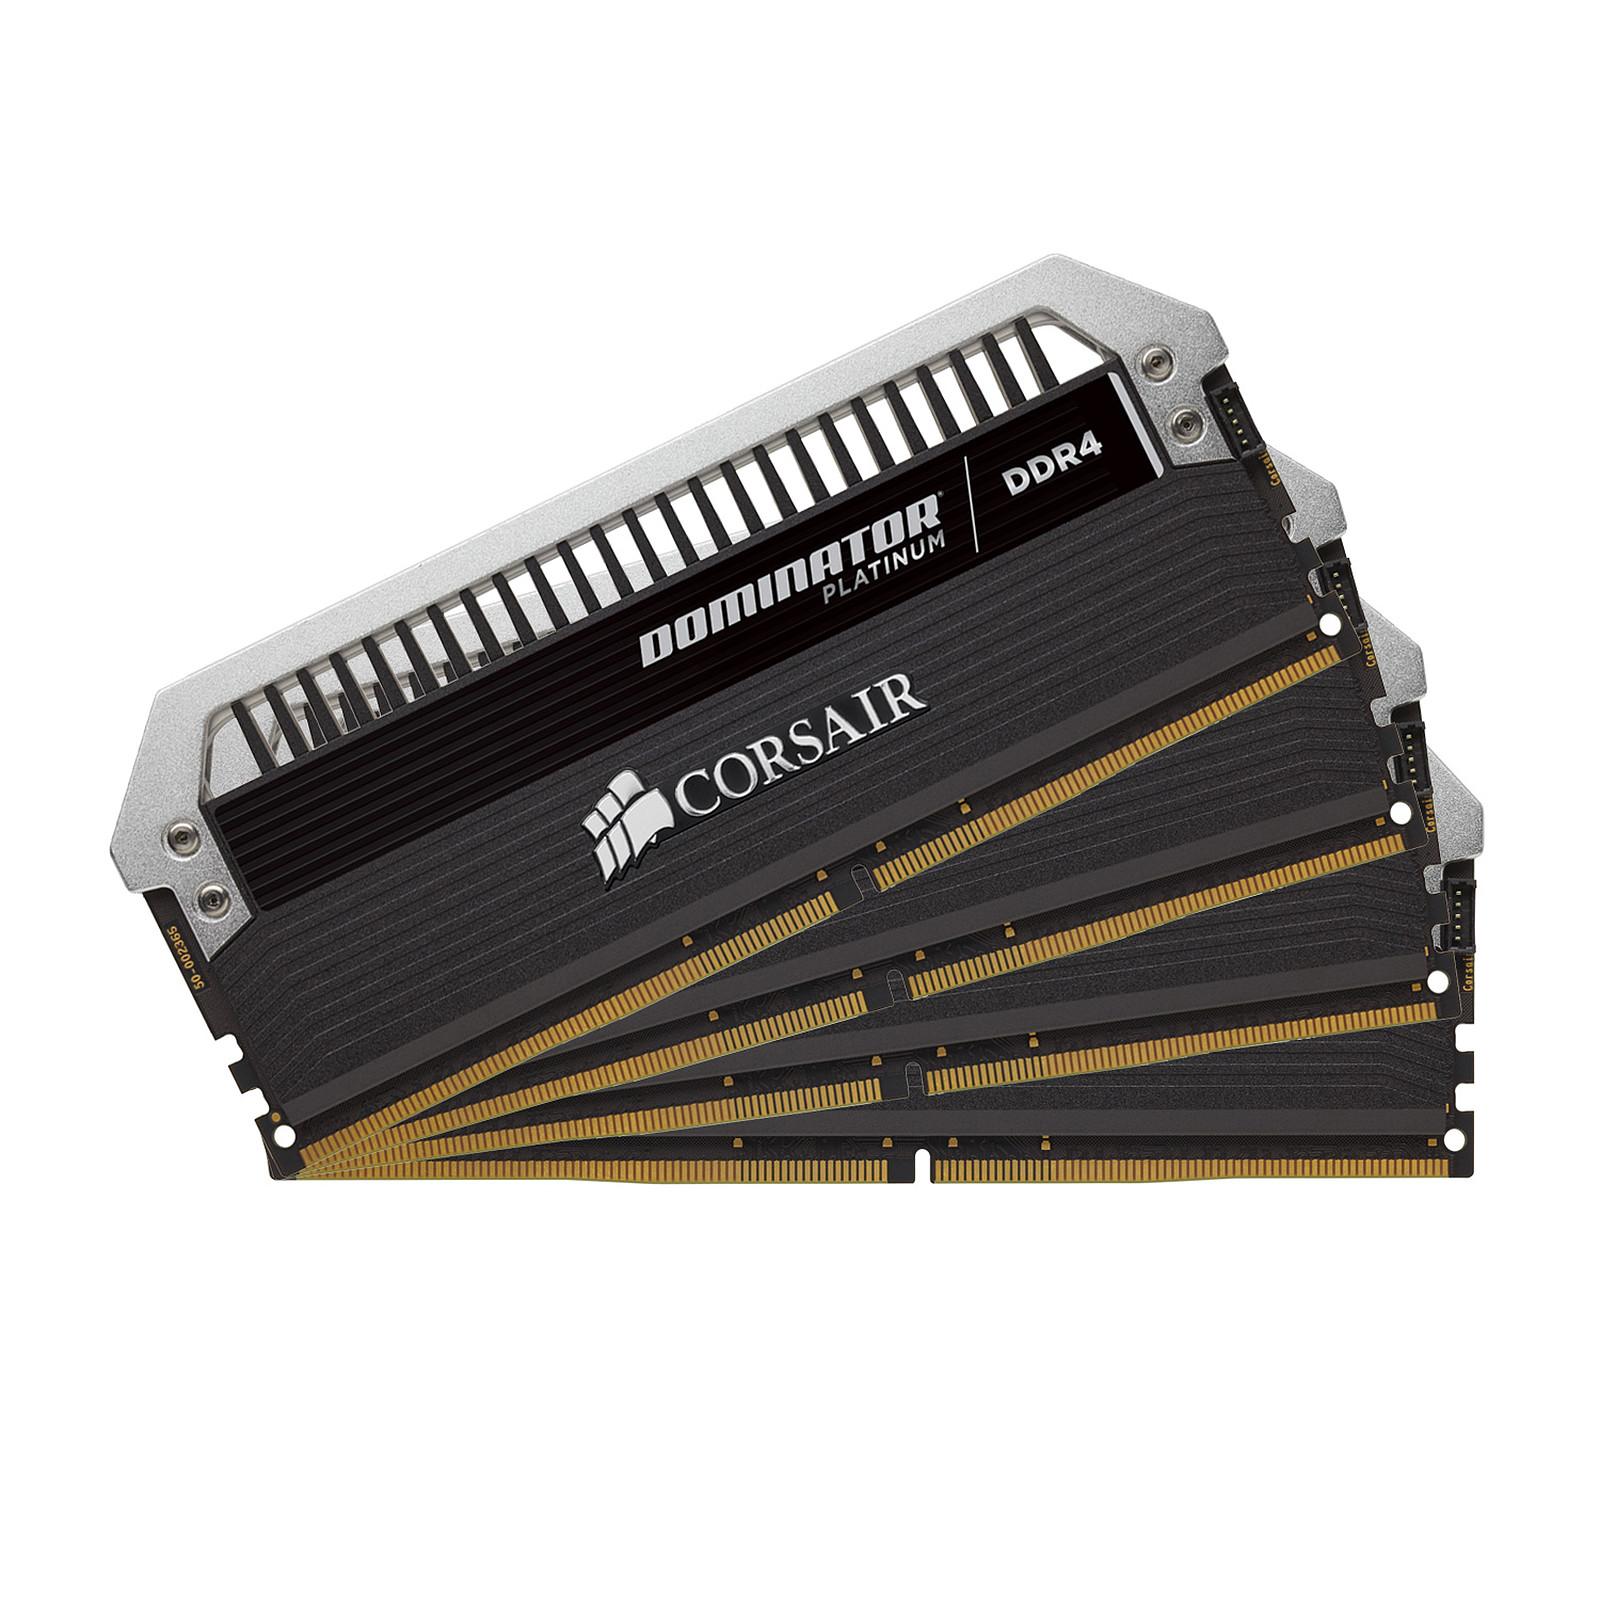 Corsair Dominator Platinum 16 Go (4x 4 Go) DDR4 3200 MHz CL16